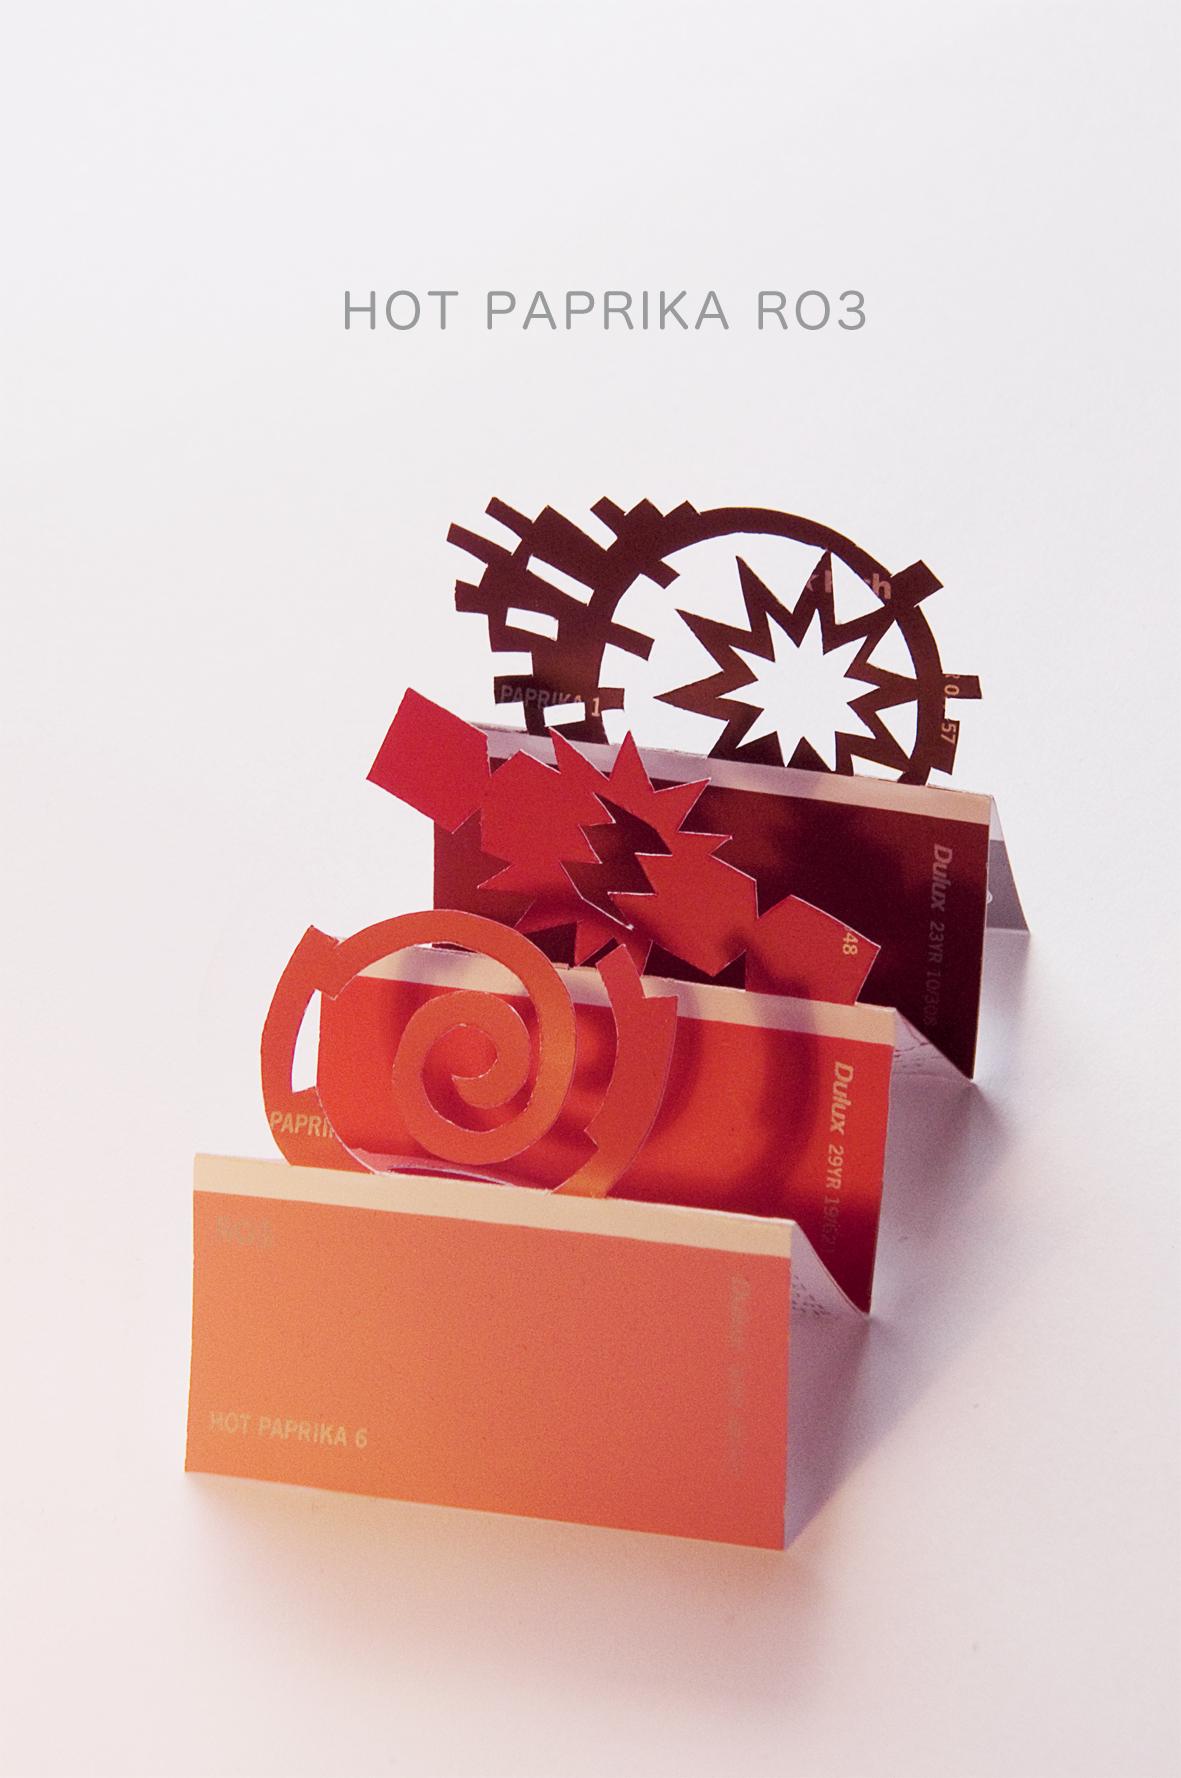 HOT PAPRIKA RO3